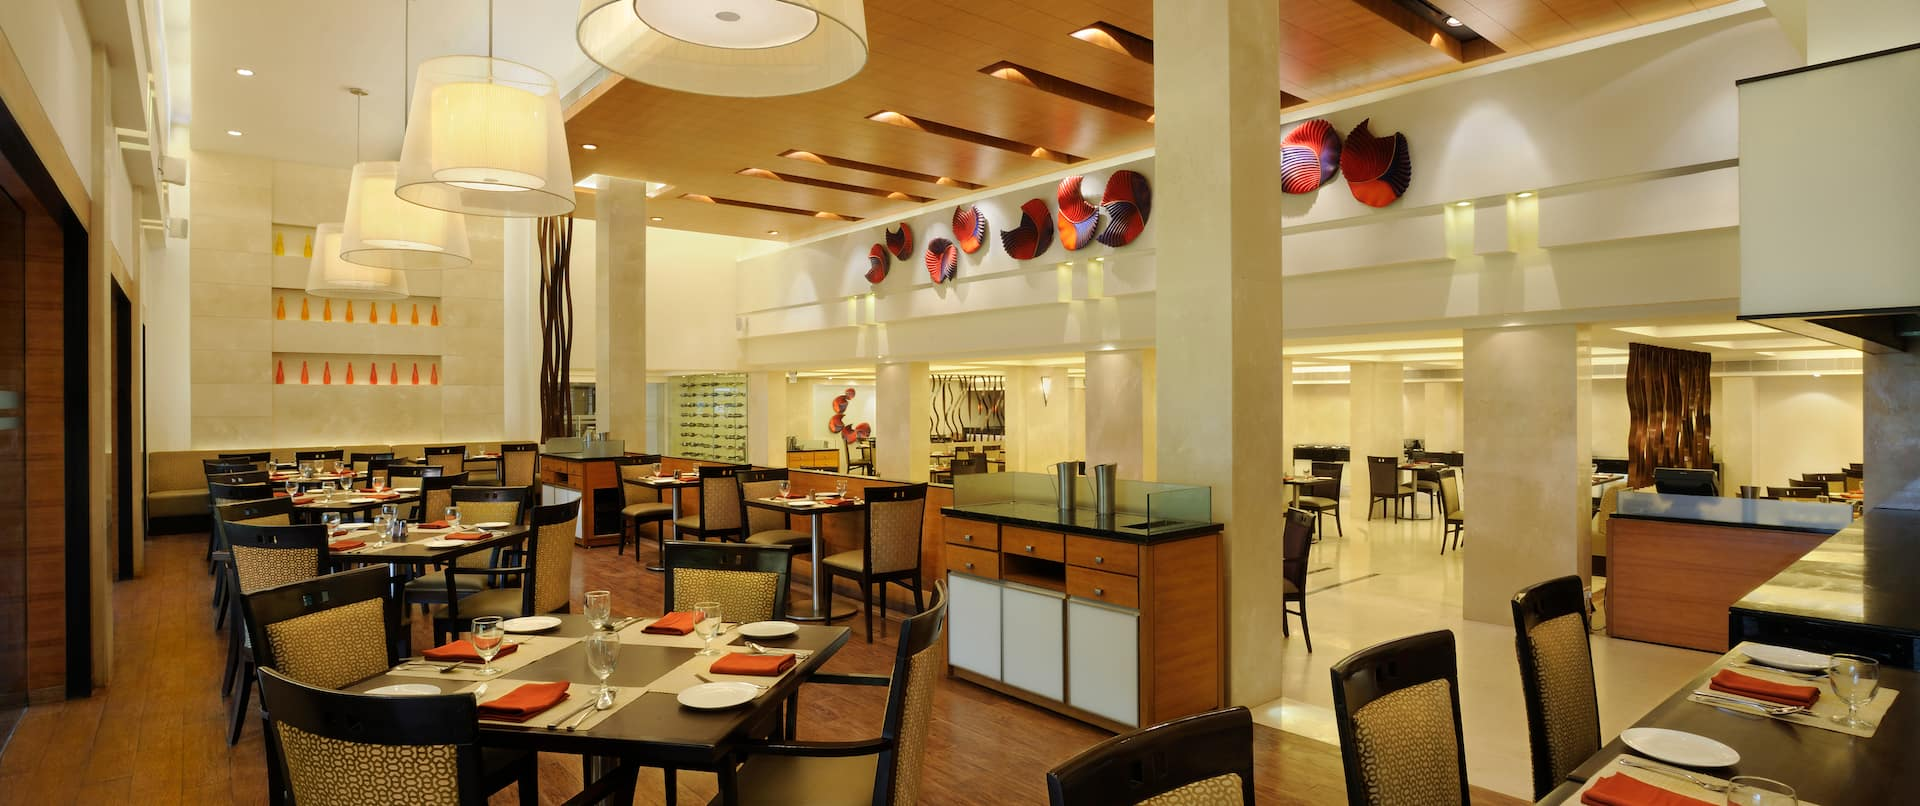 Flame, restaurant at lobby level